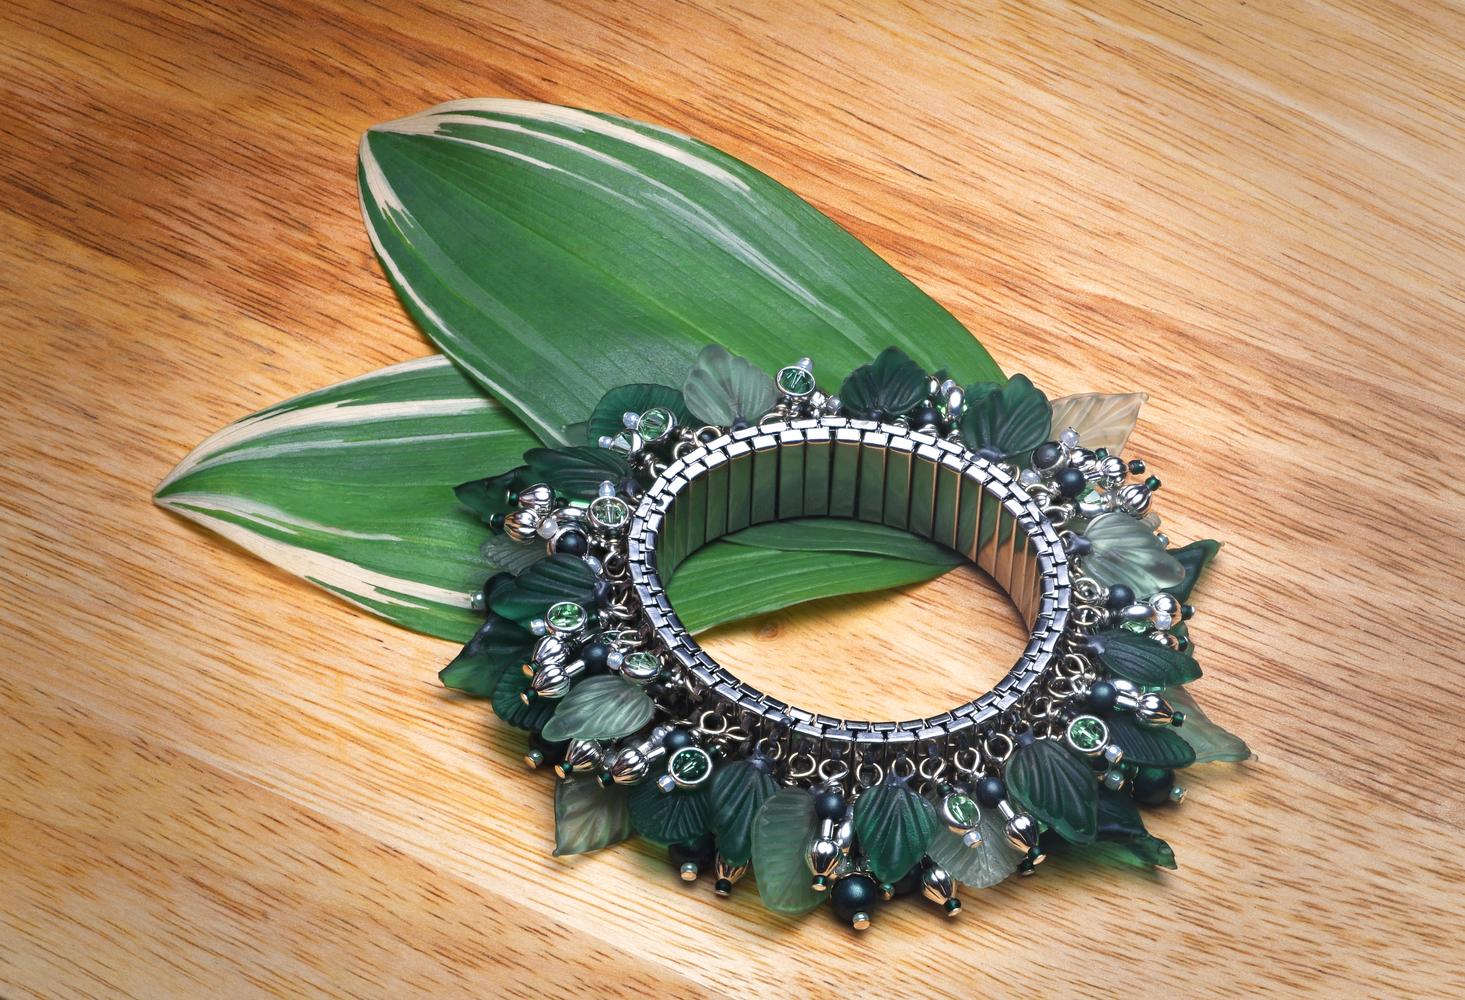 bracelet by Dick Blystone